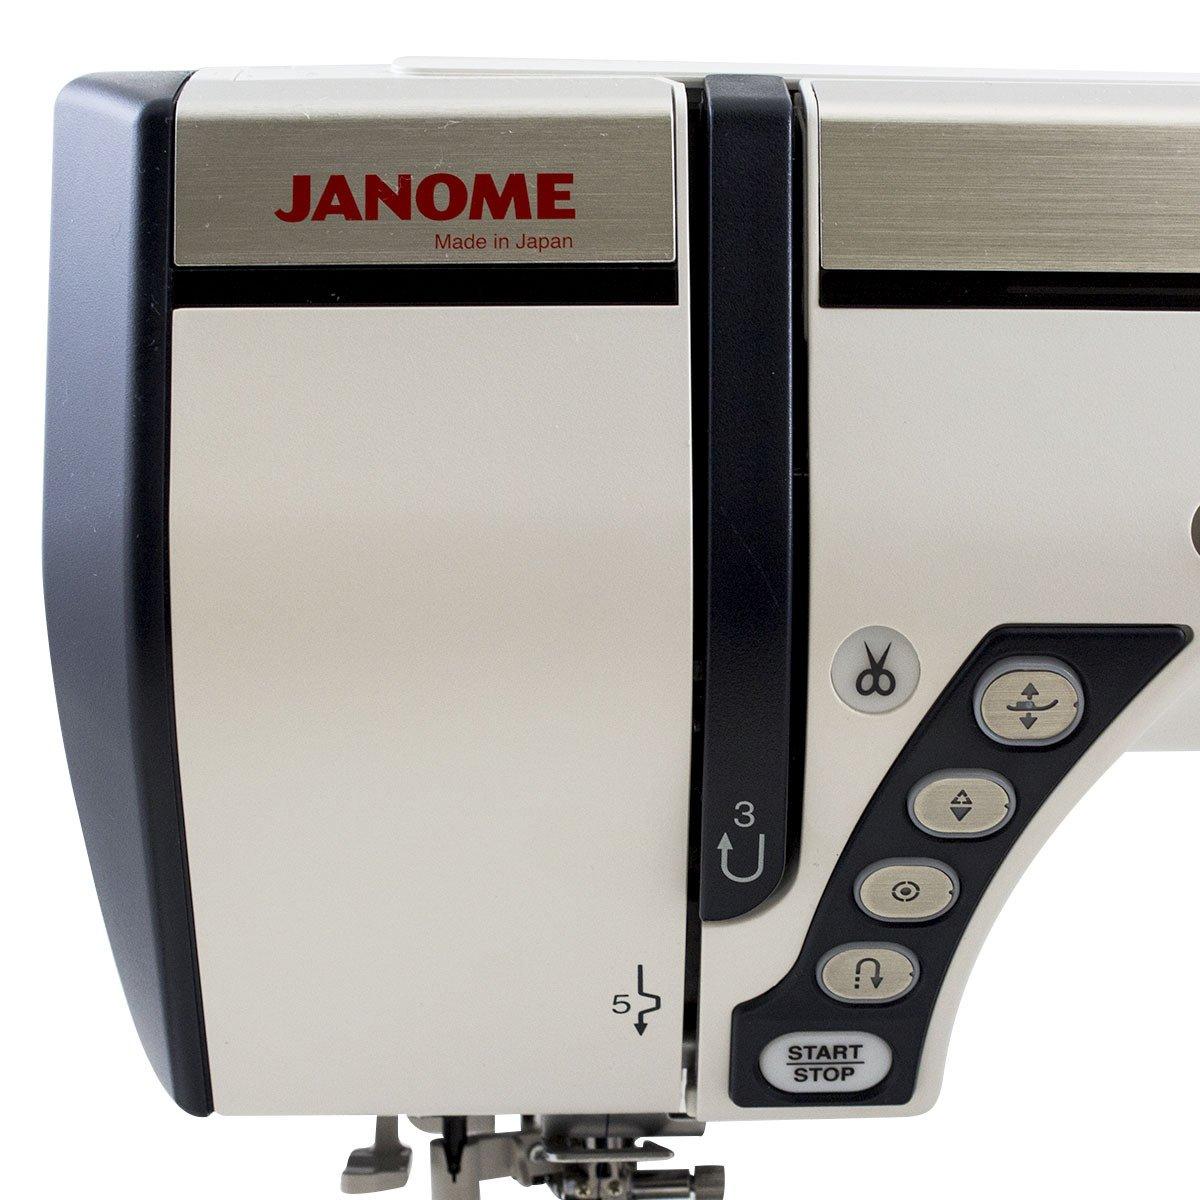 Janome memory craft 12000 - Amazon Com Janome Horizon Memory Craft 12000 Embroidery And Sewing Machine